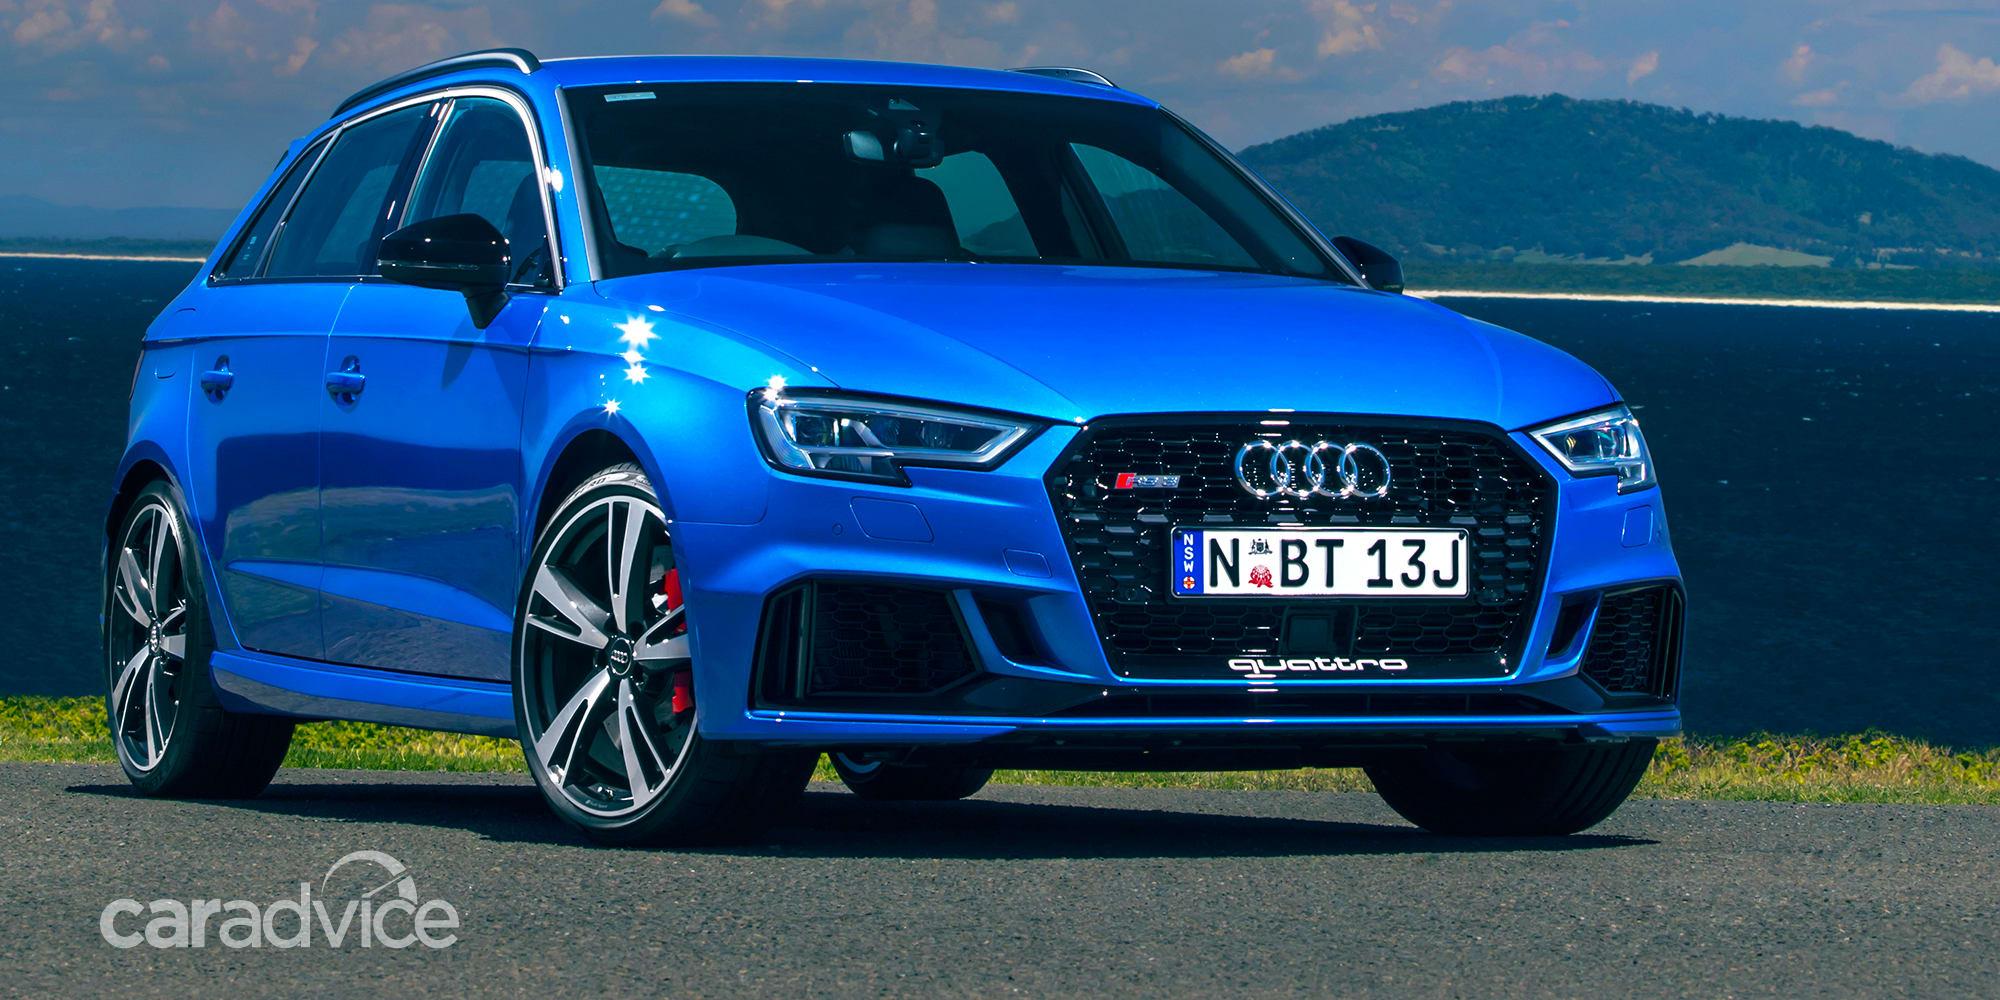 2021 Audi RS3 Sportback and sedan spied | CarAdvice